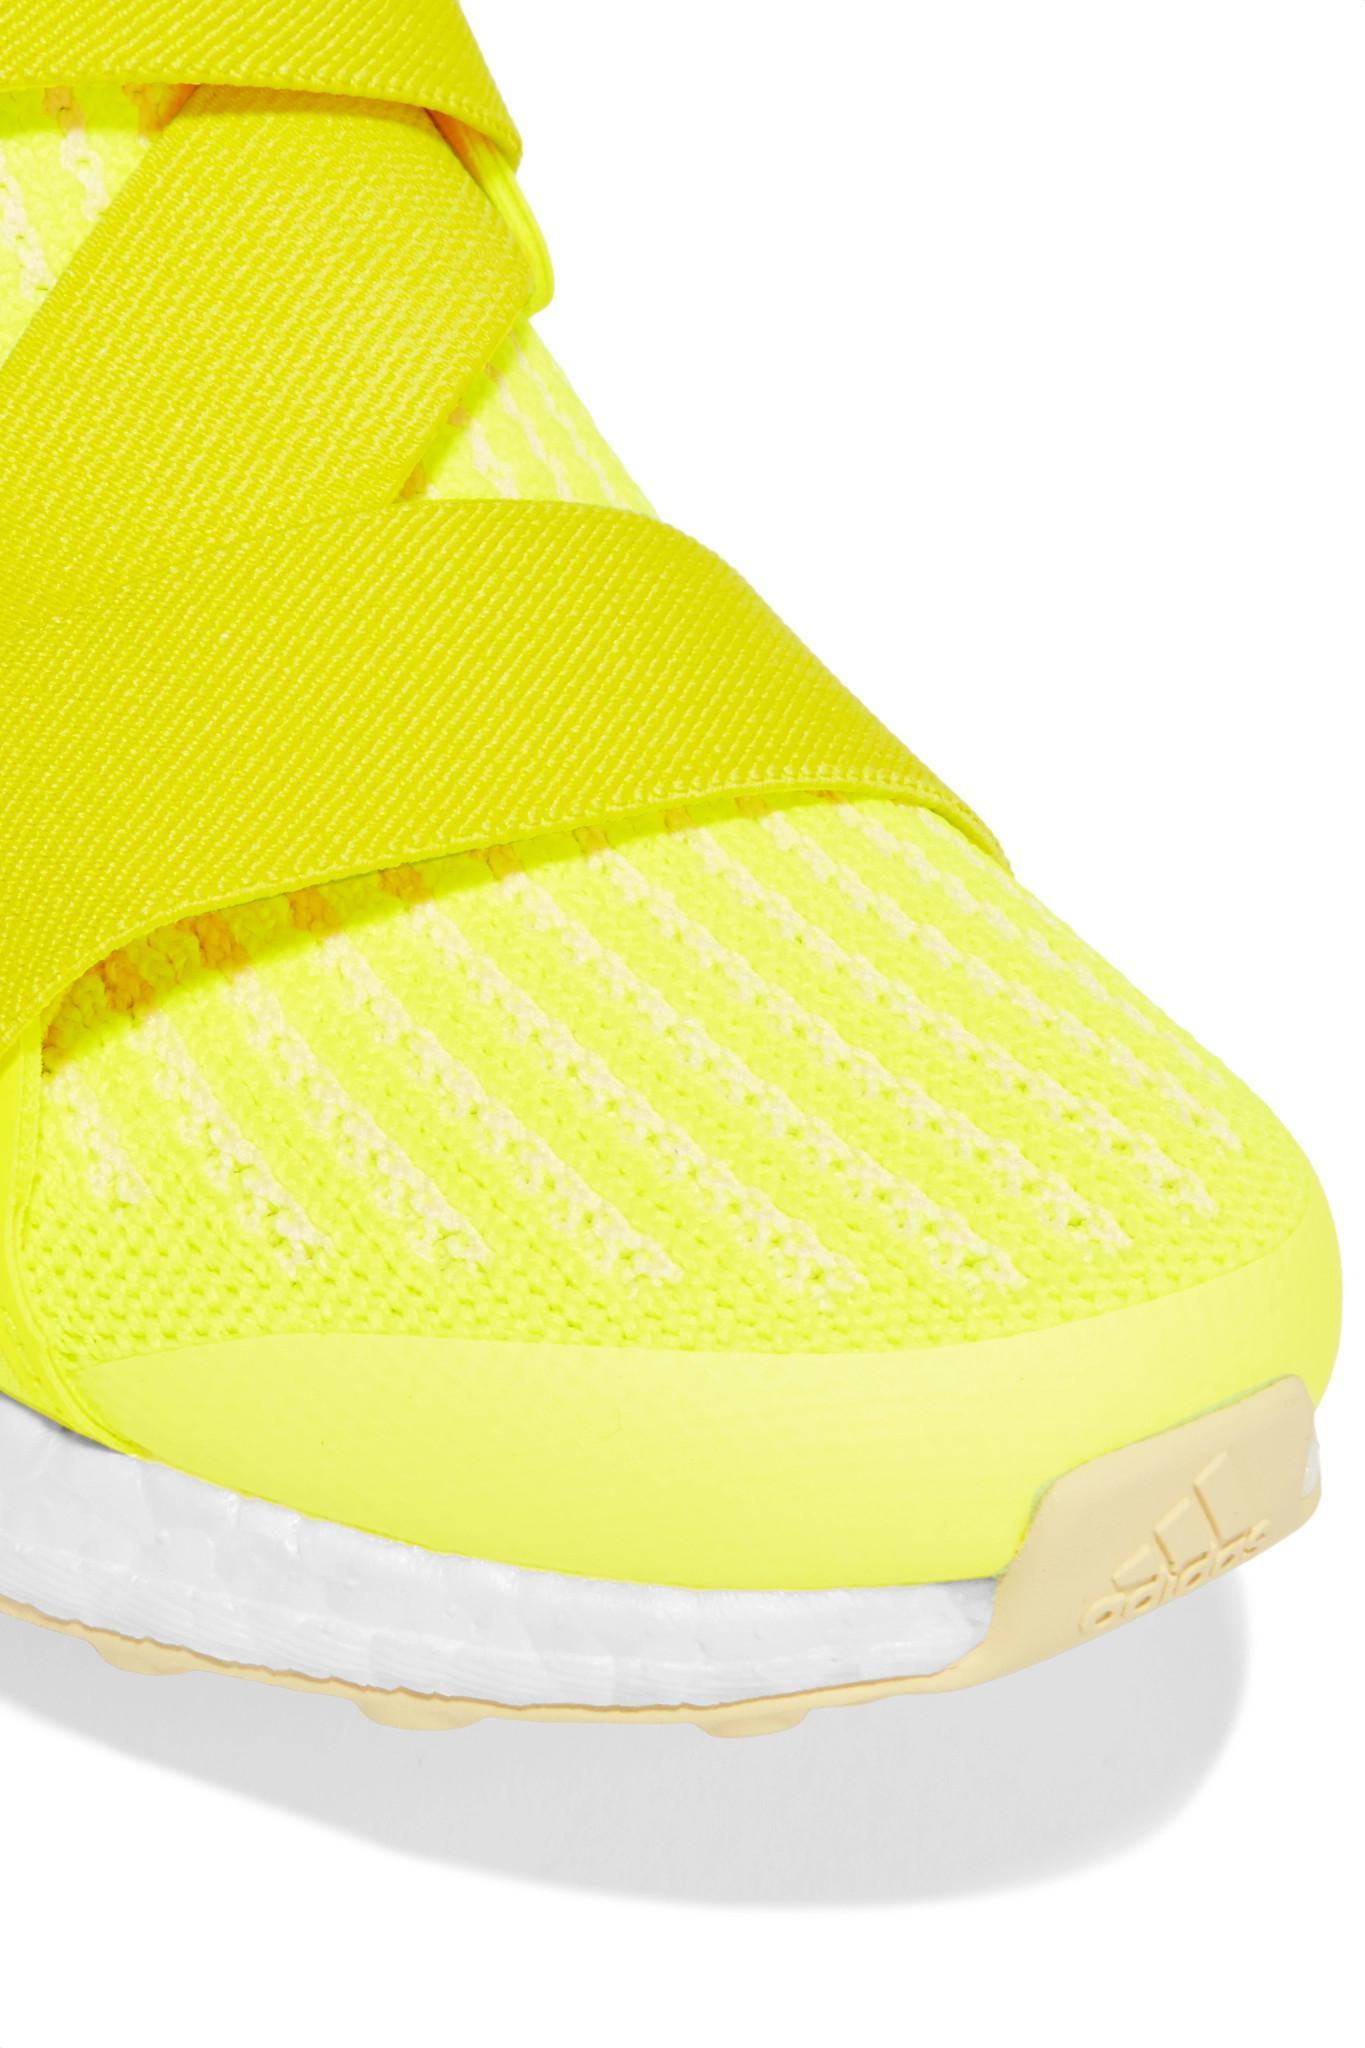 on sale cacc0 7ceca Adidas By Stella McCartney - Yellow Ultraboost X Neon Primeknit Sneakers -  Lyst. View fullscreen